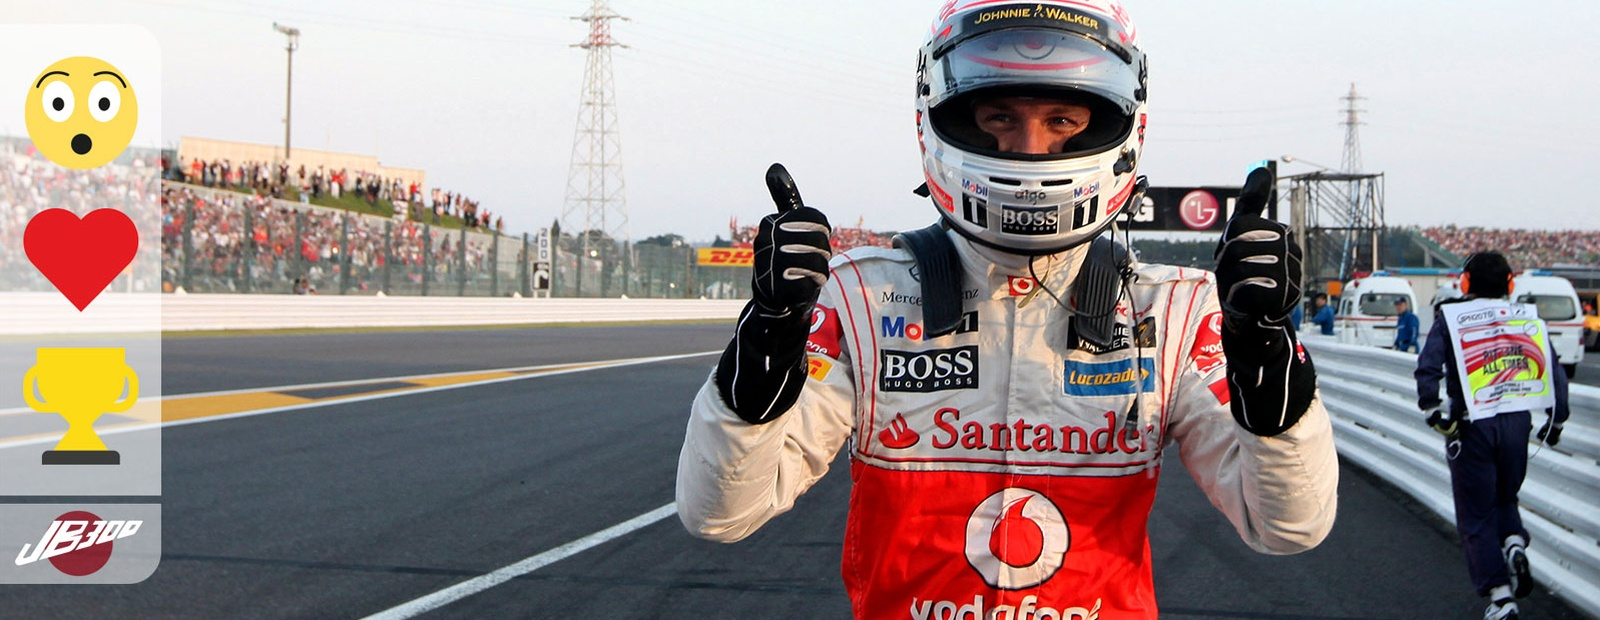 JB300: Races 201 to 300